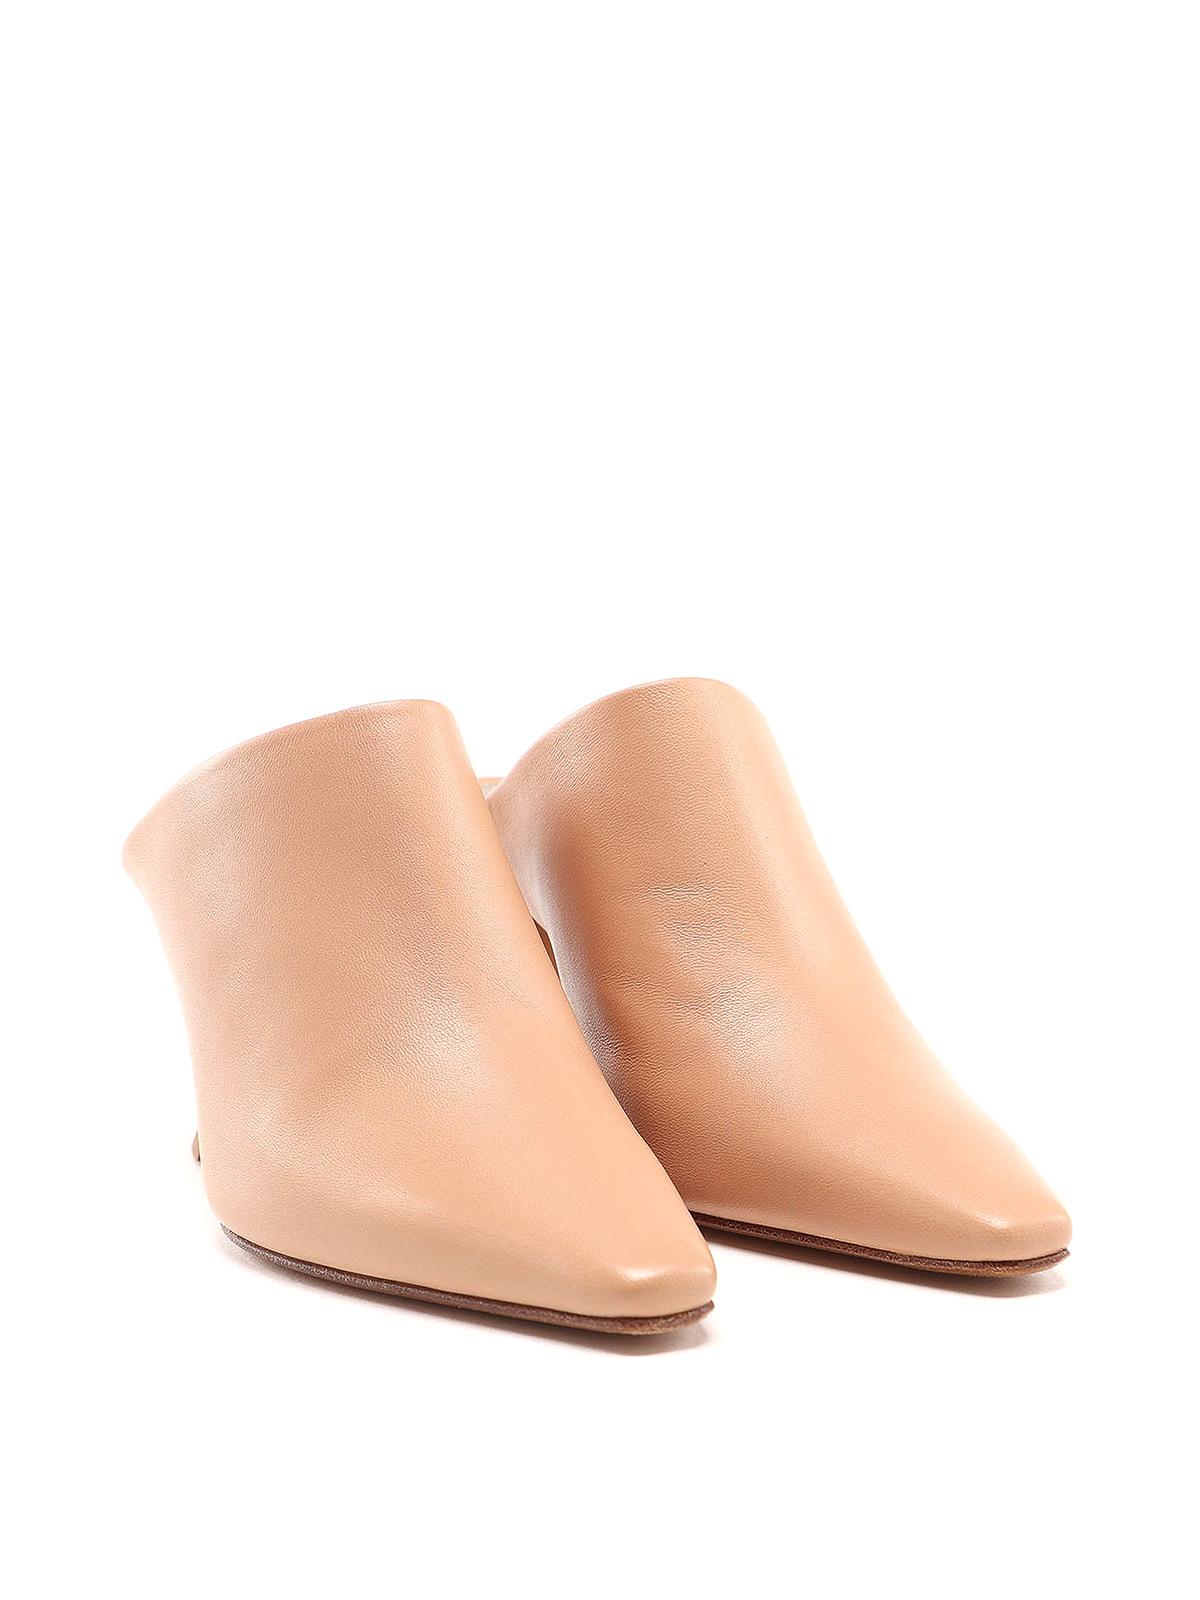 Bottega Veneta - Leather heeled mules